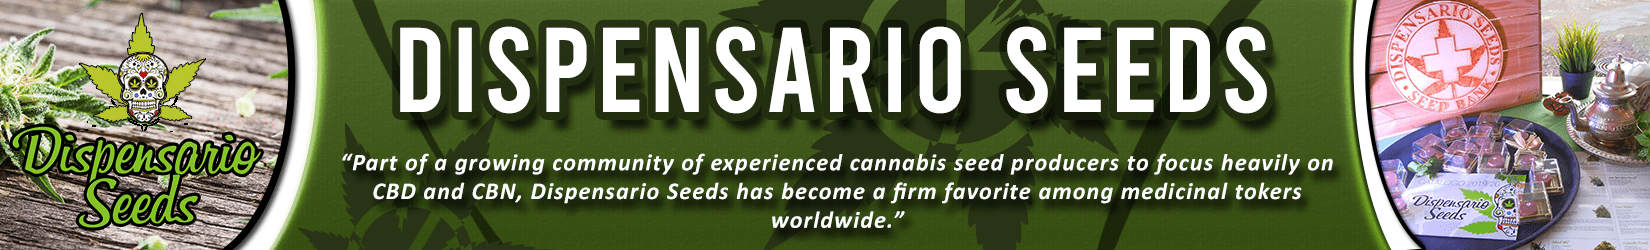 Cannabis Seeds Breeder - Dispensario